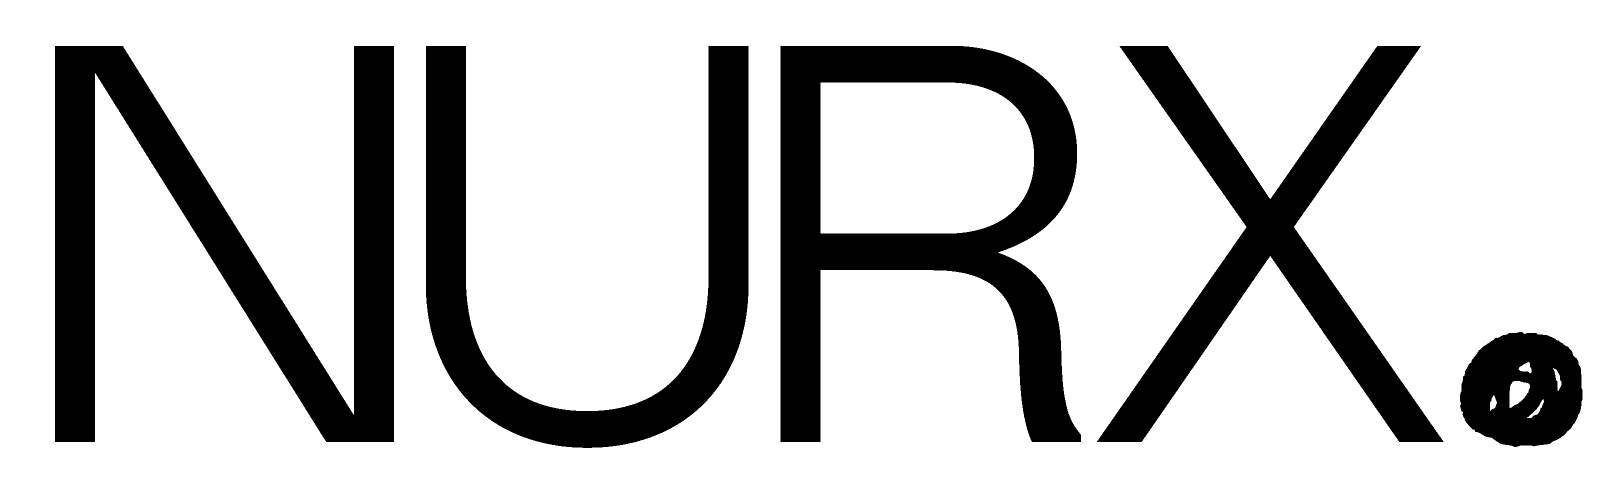 nurx_logo.jpg